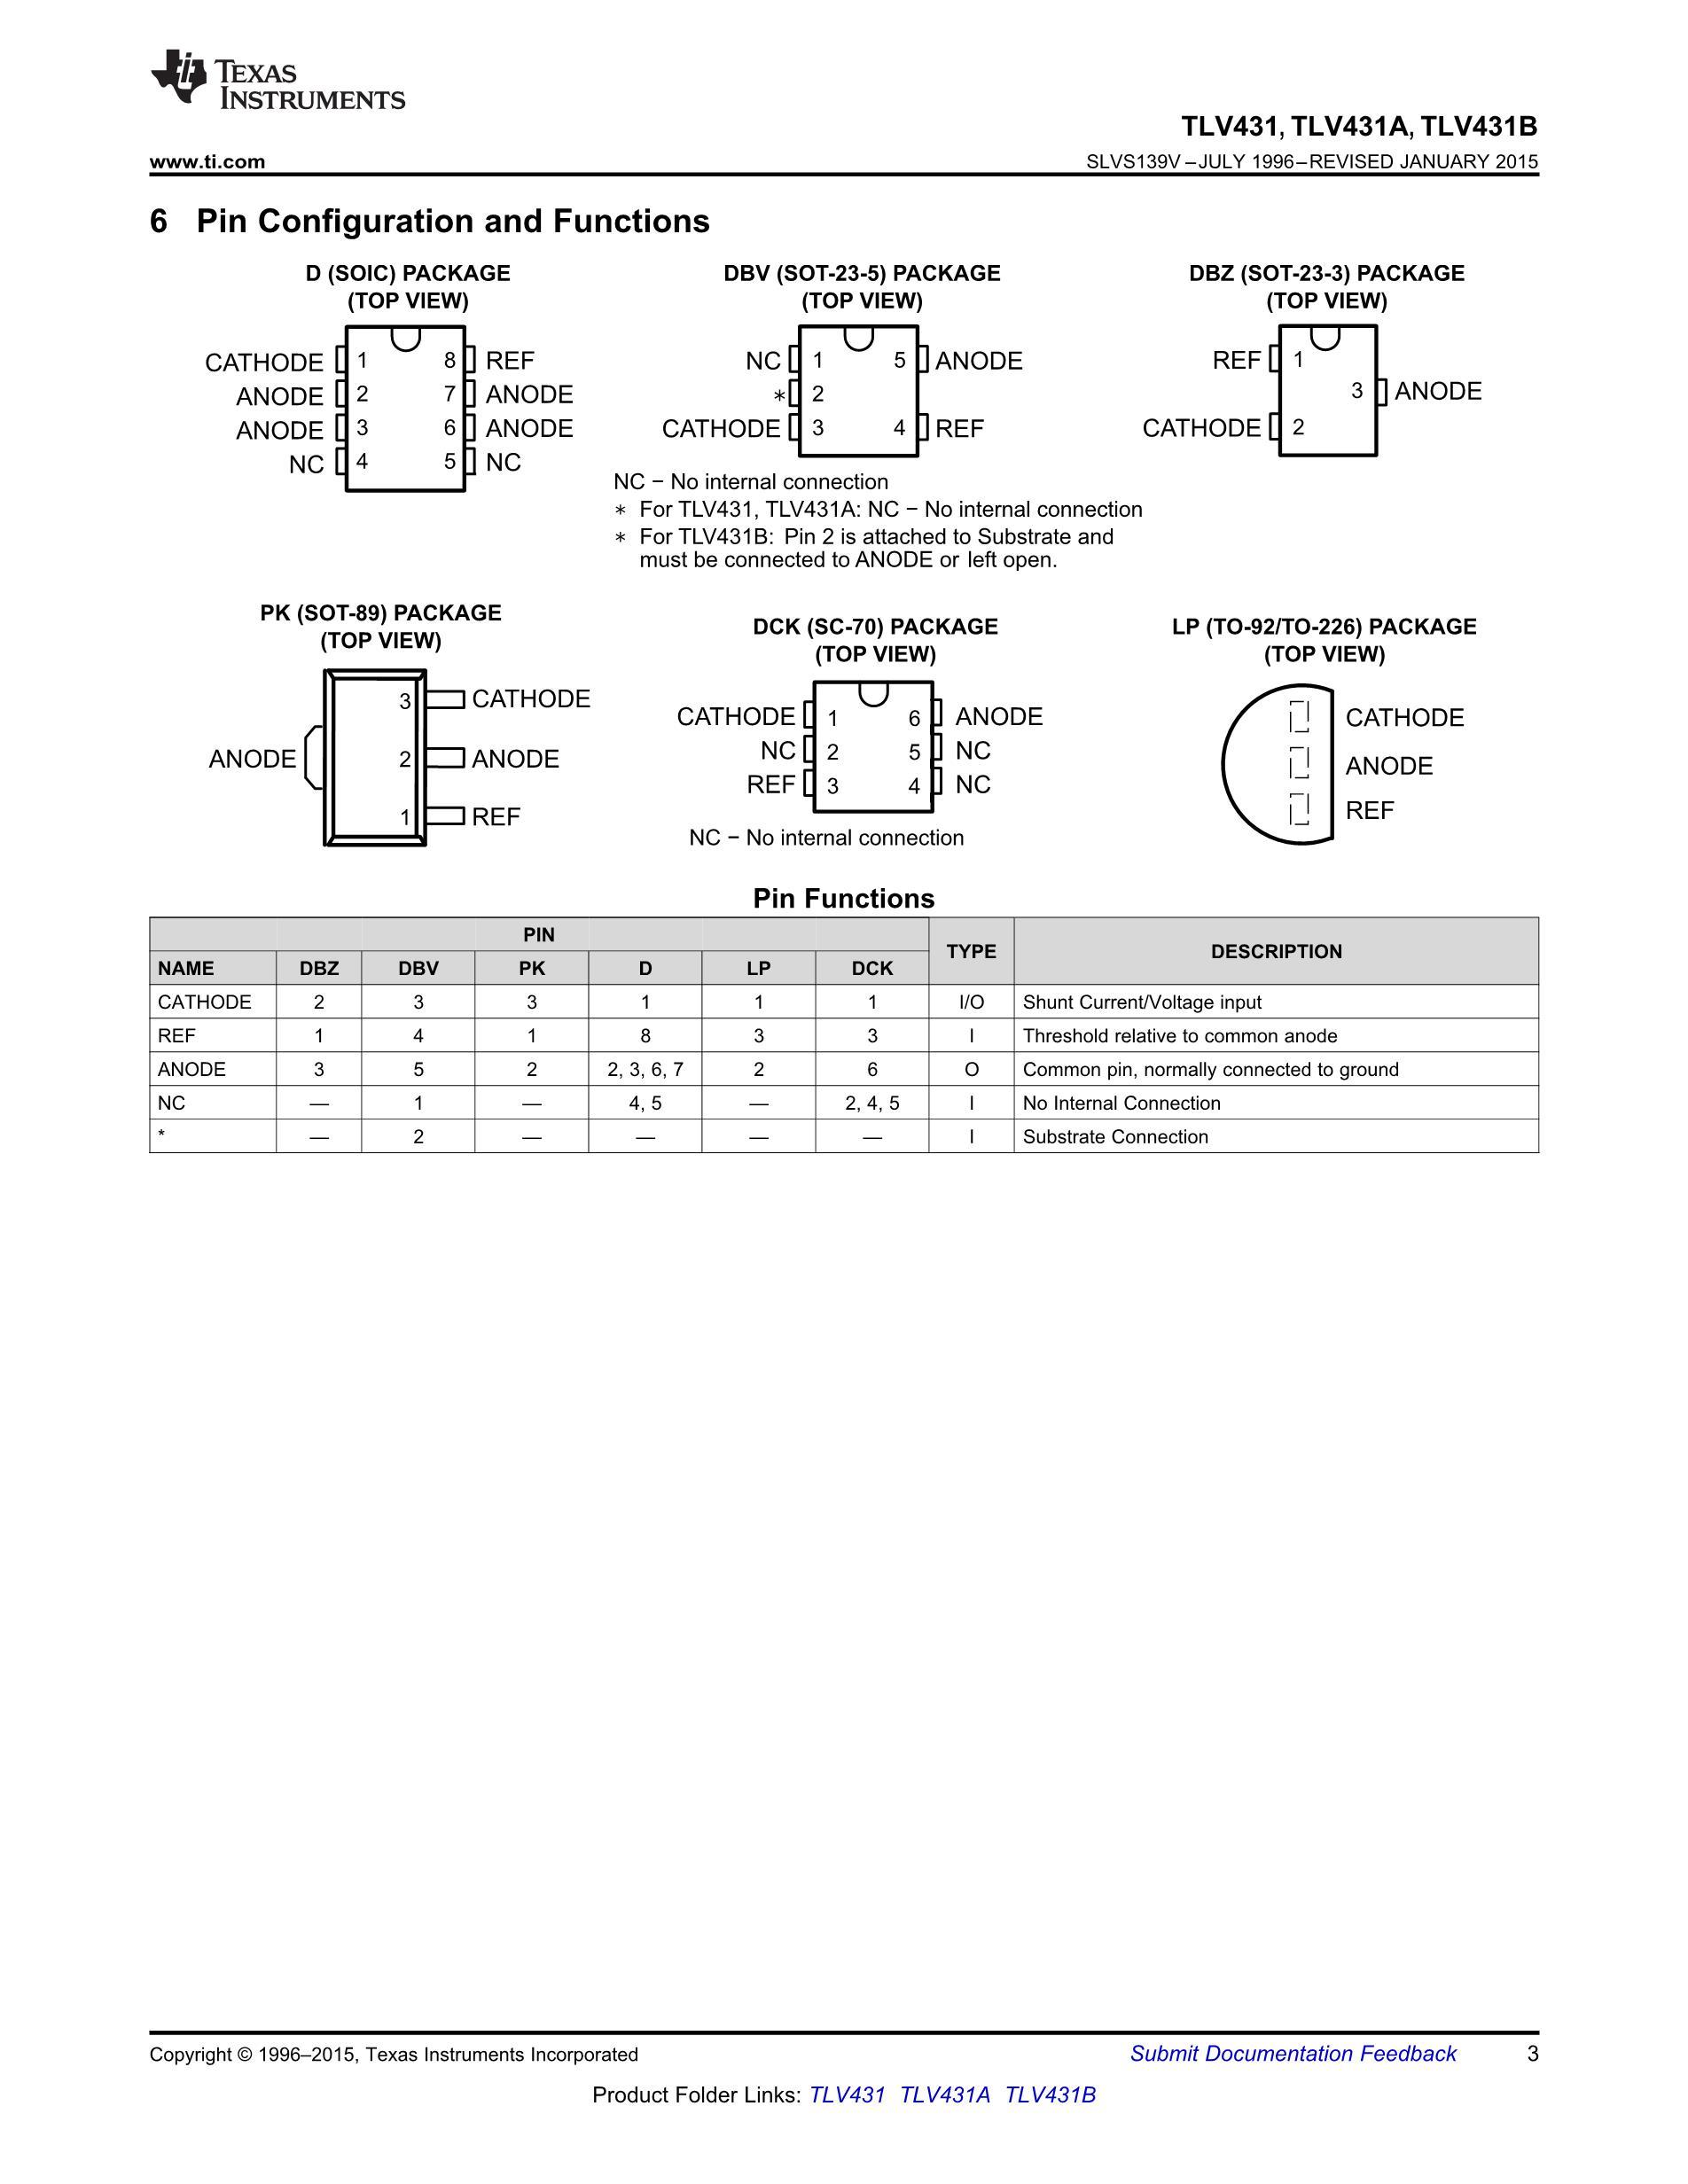 TLV431AQPK's pdf picture 3